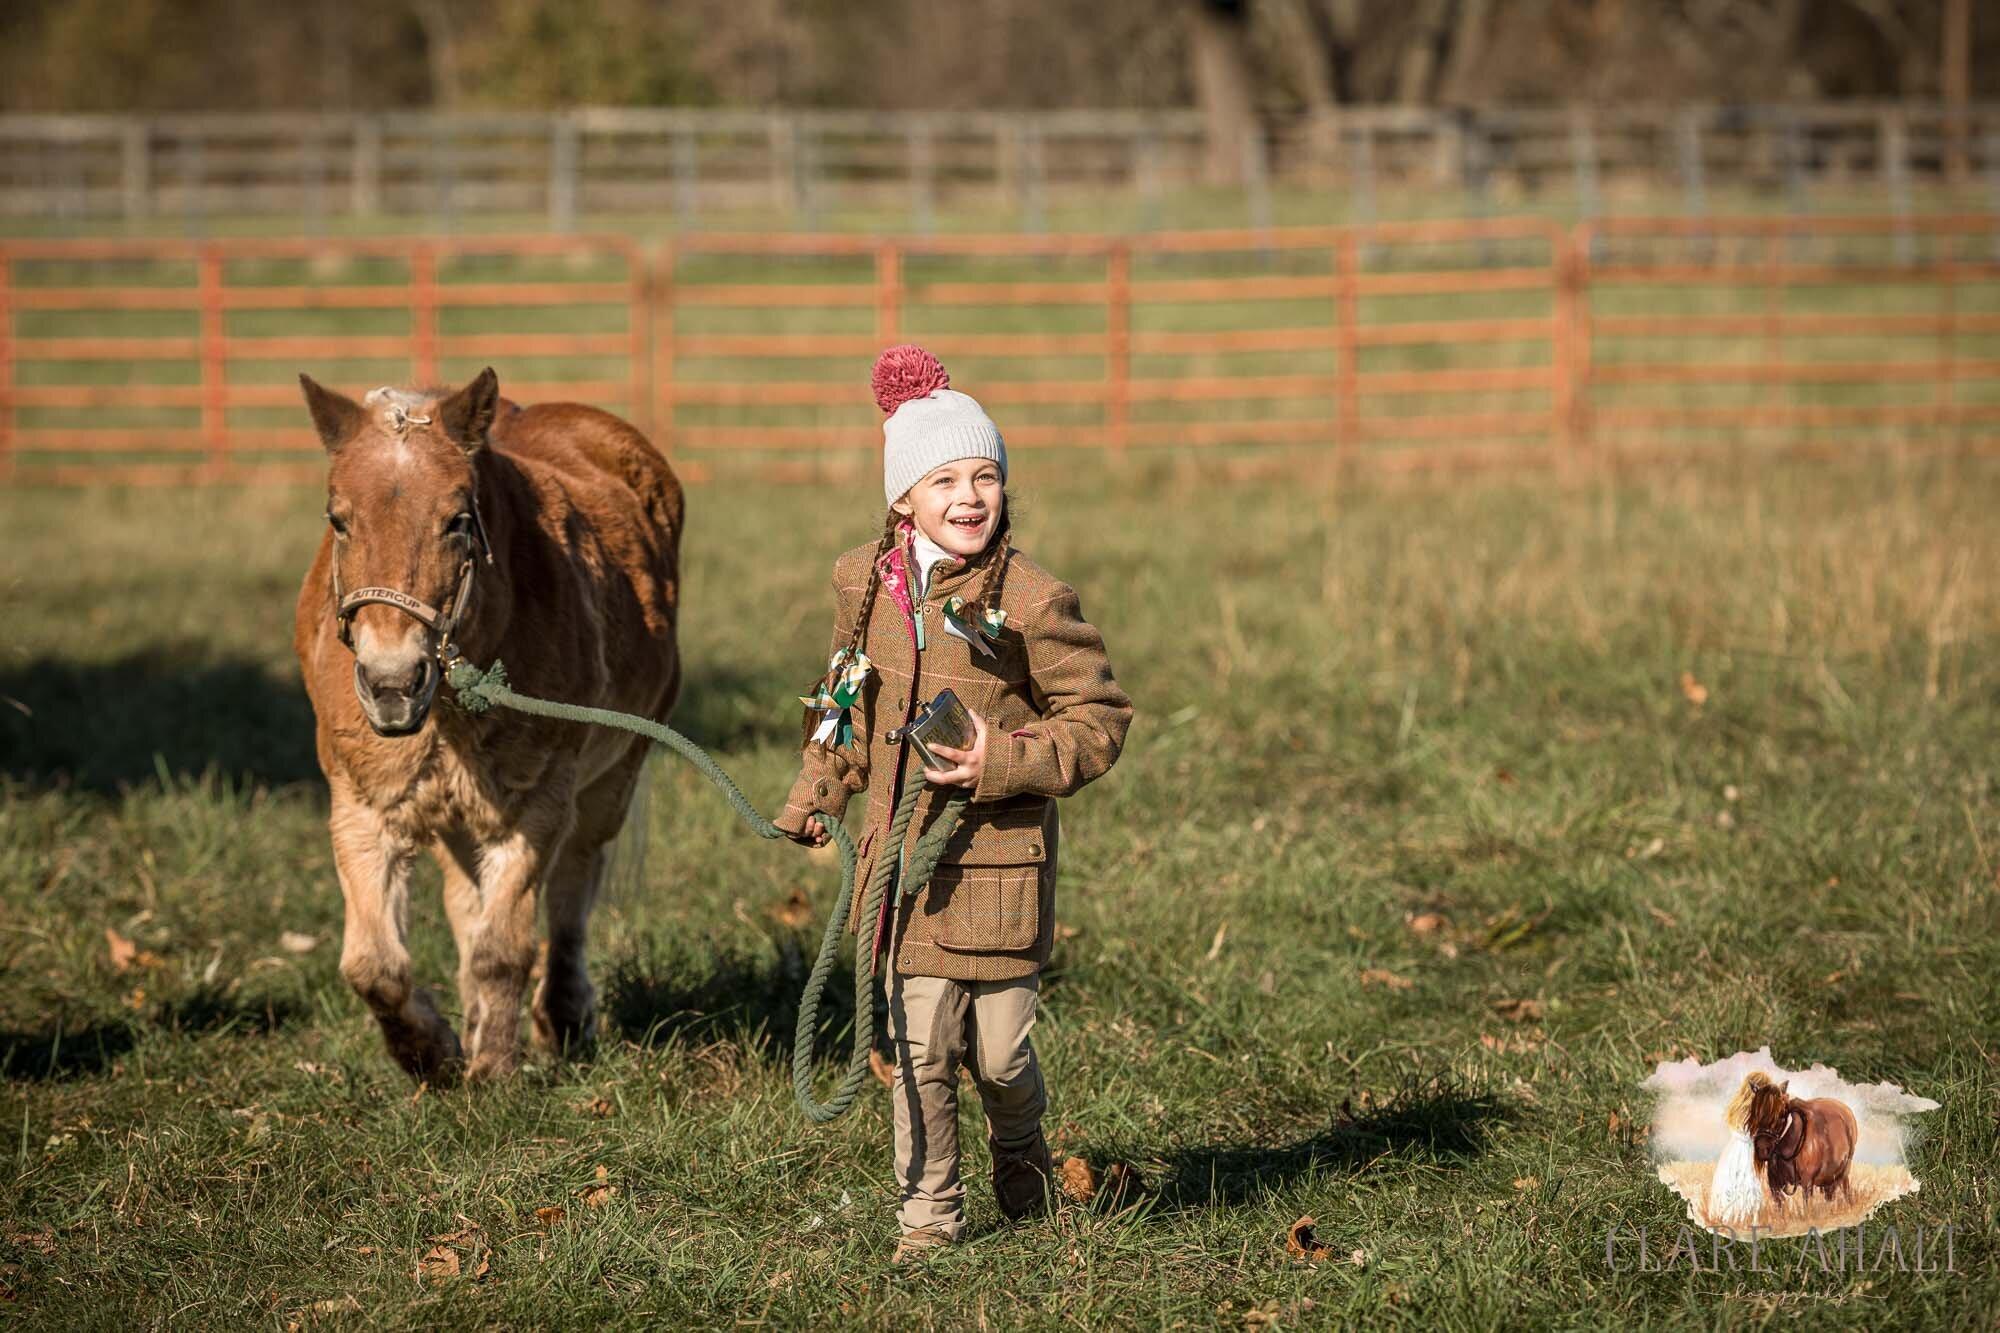 equine_photographer_potomac_md_equine_photographer_middleburg_VA_equine_portraiture_loudon_county_VA-1307.jpg